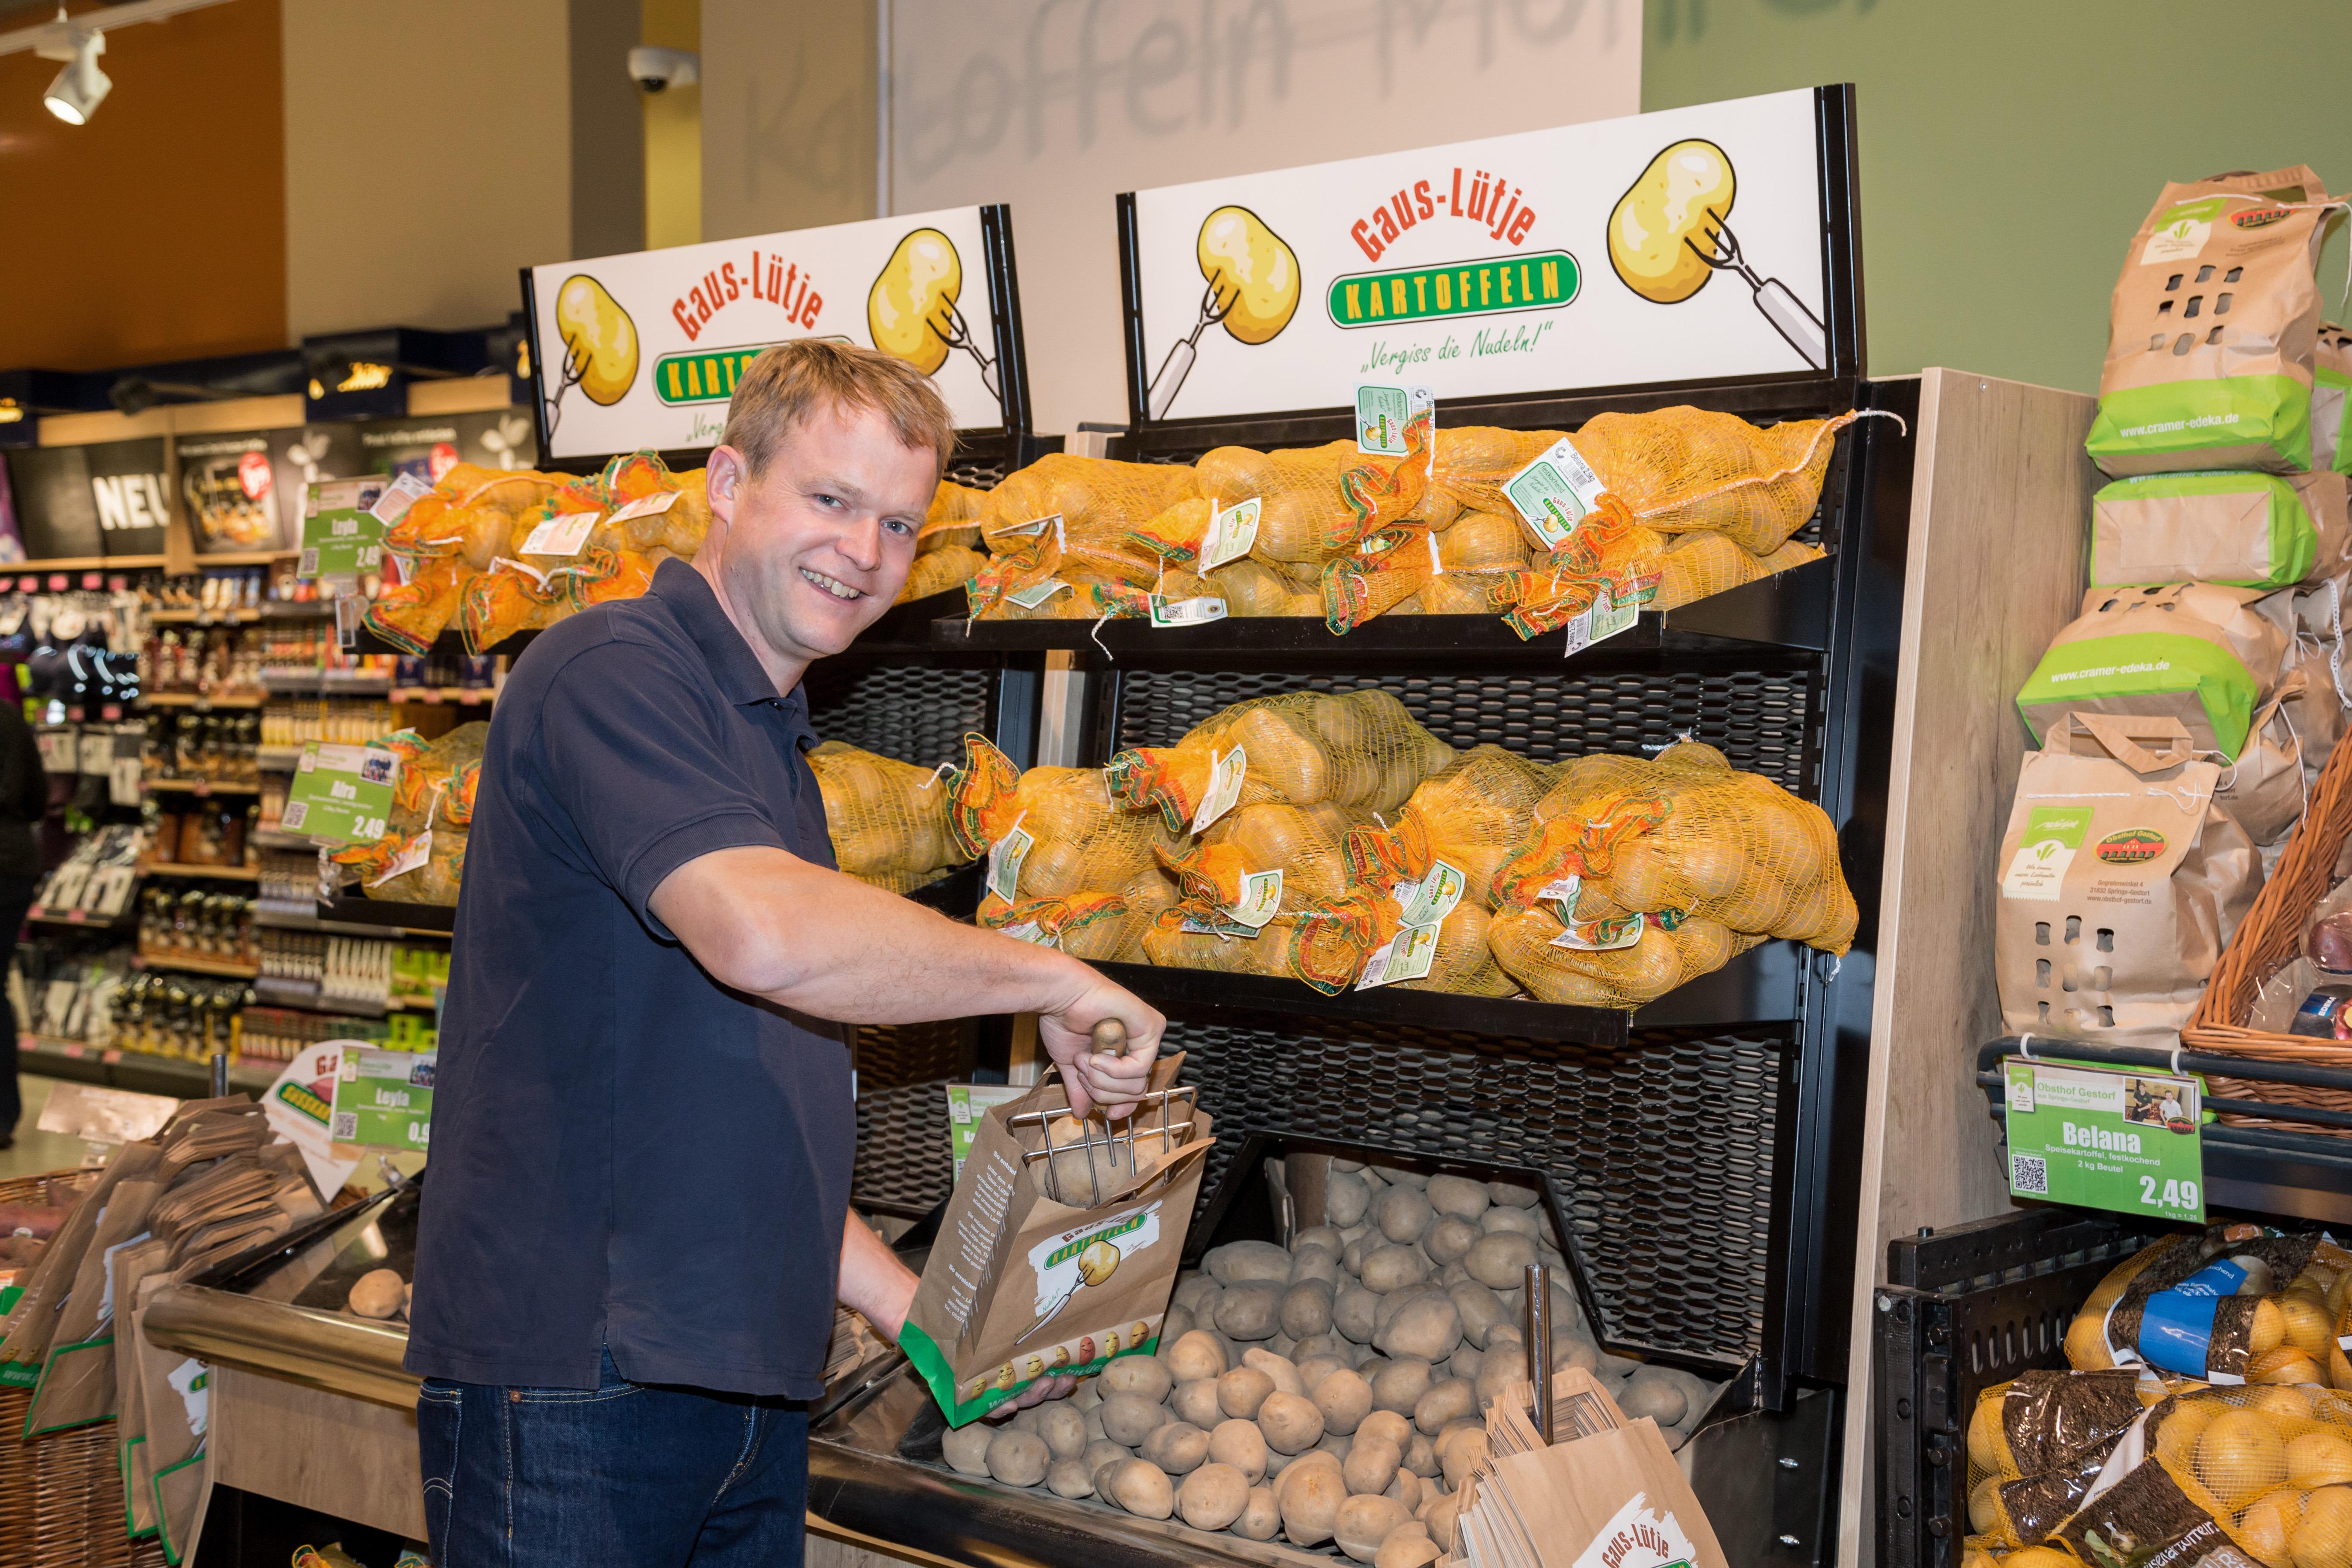 Kartoffelprodukte vom Hof Gaus-Lütje